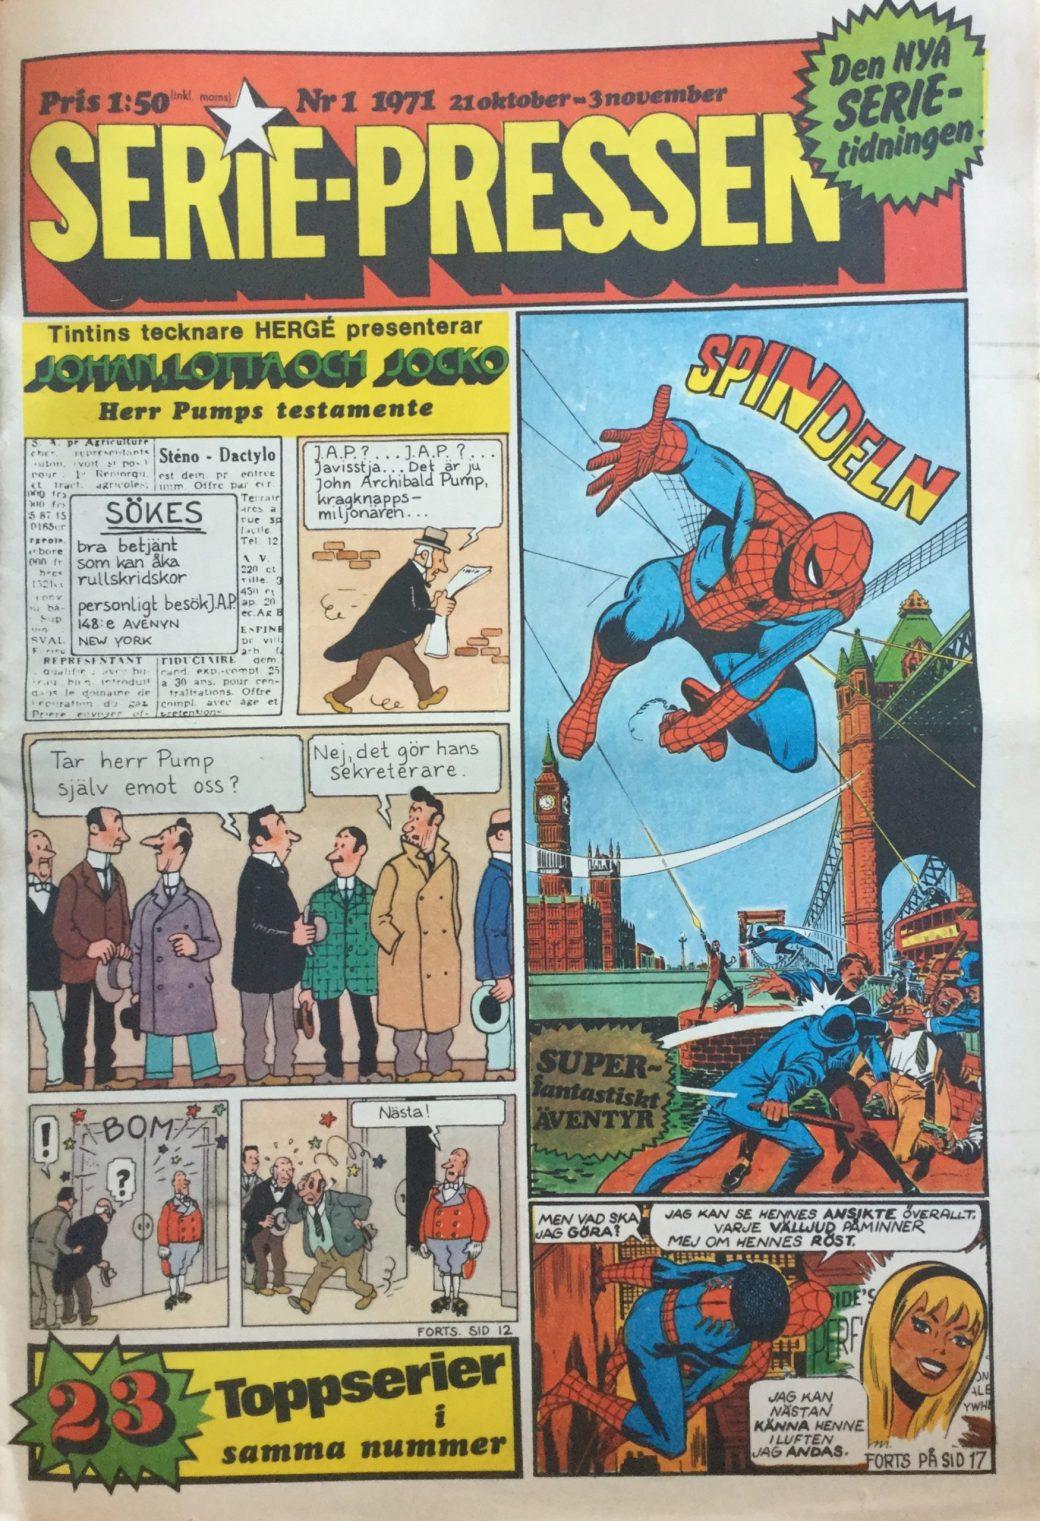 Serie-Pressen nr 1, 1971, premiärnumret